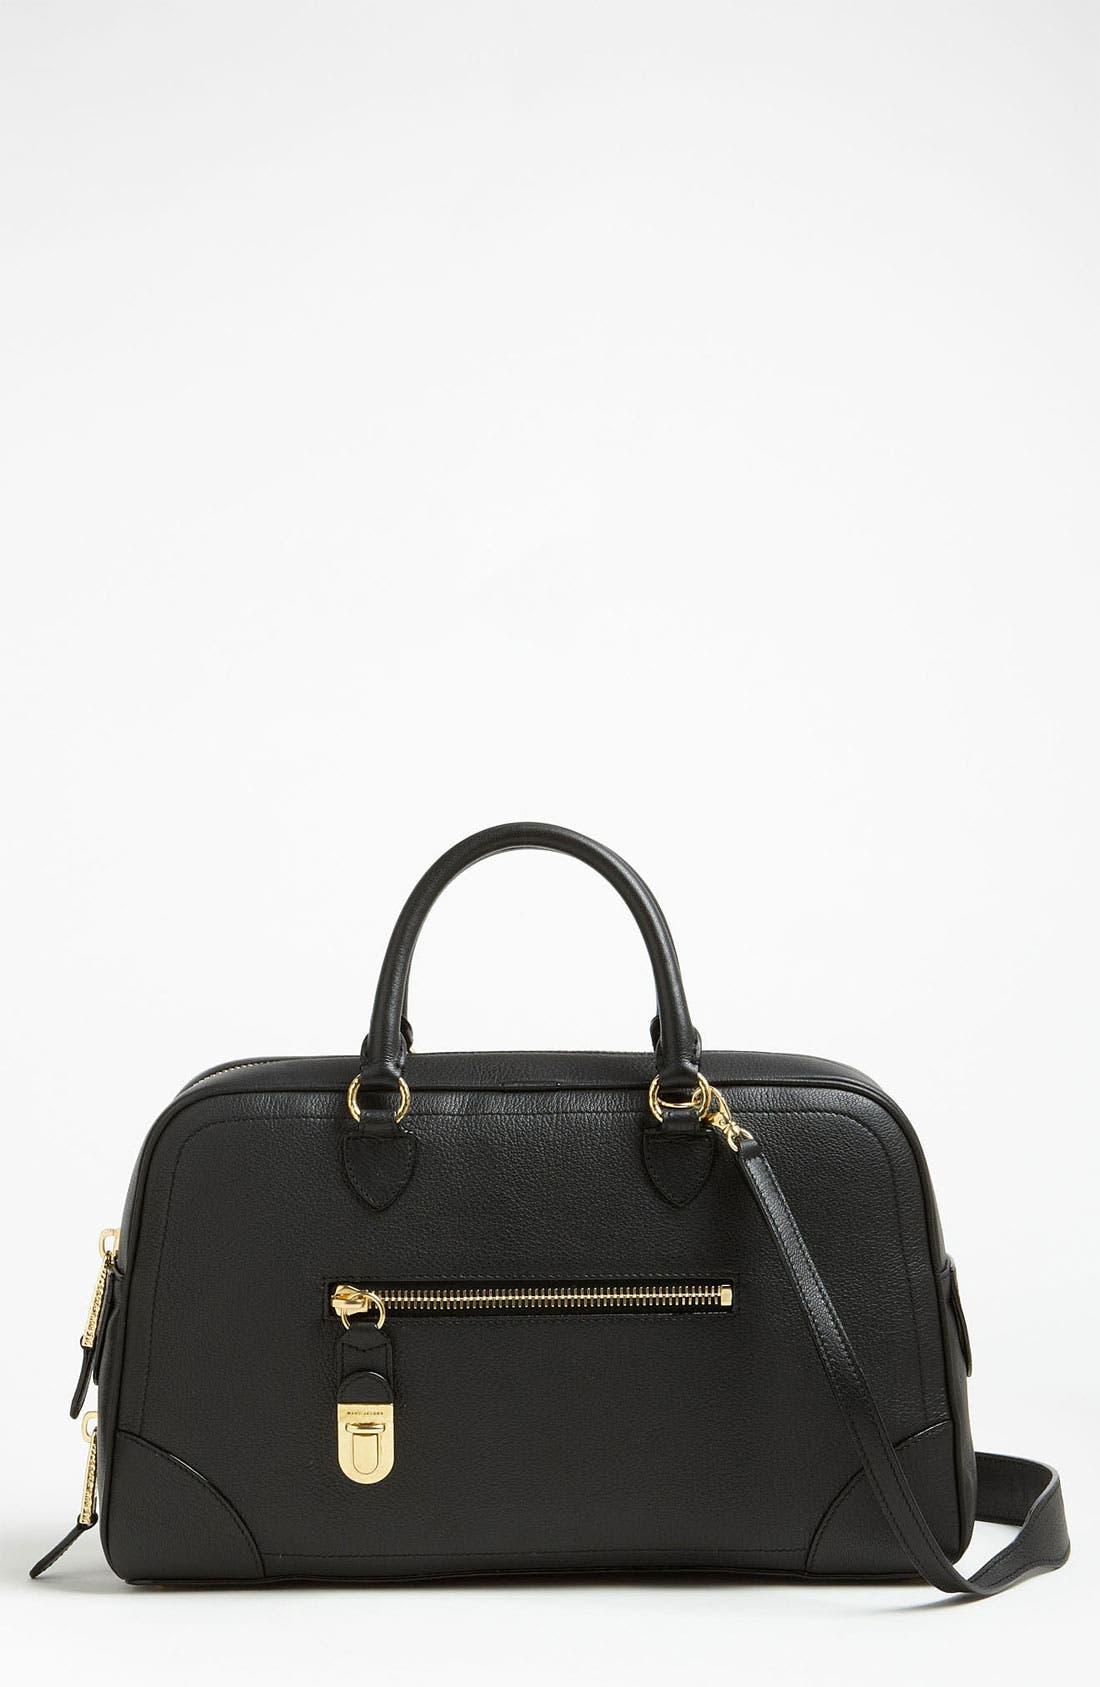 Main Image - MARC JACOBS 'Venetia' Leather Satchel